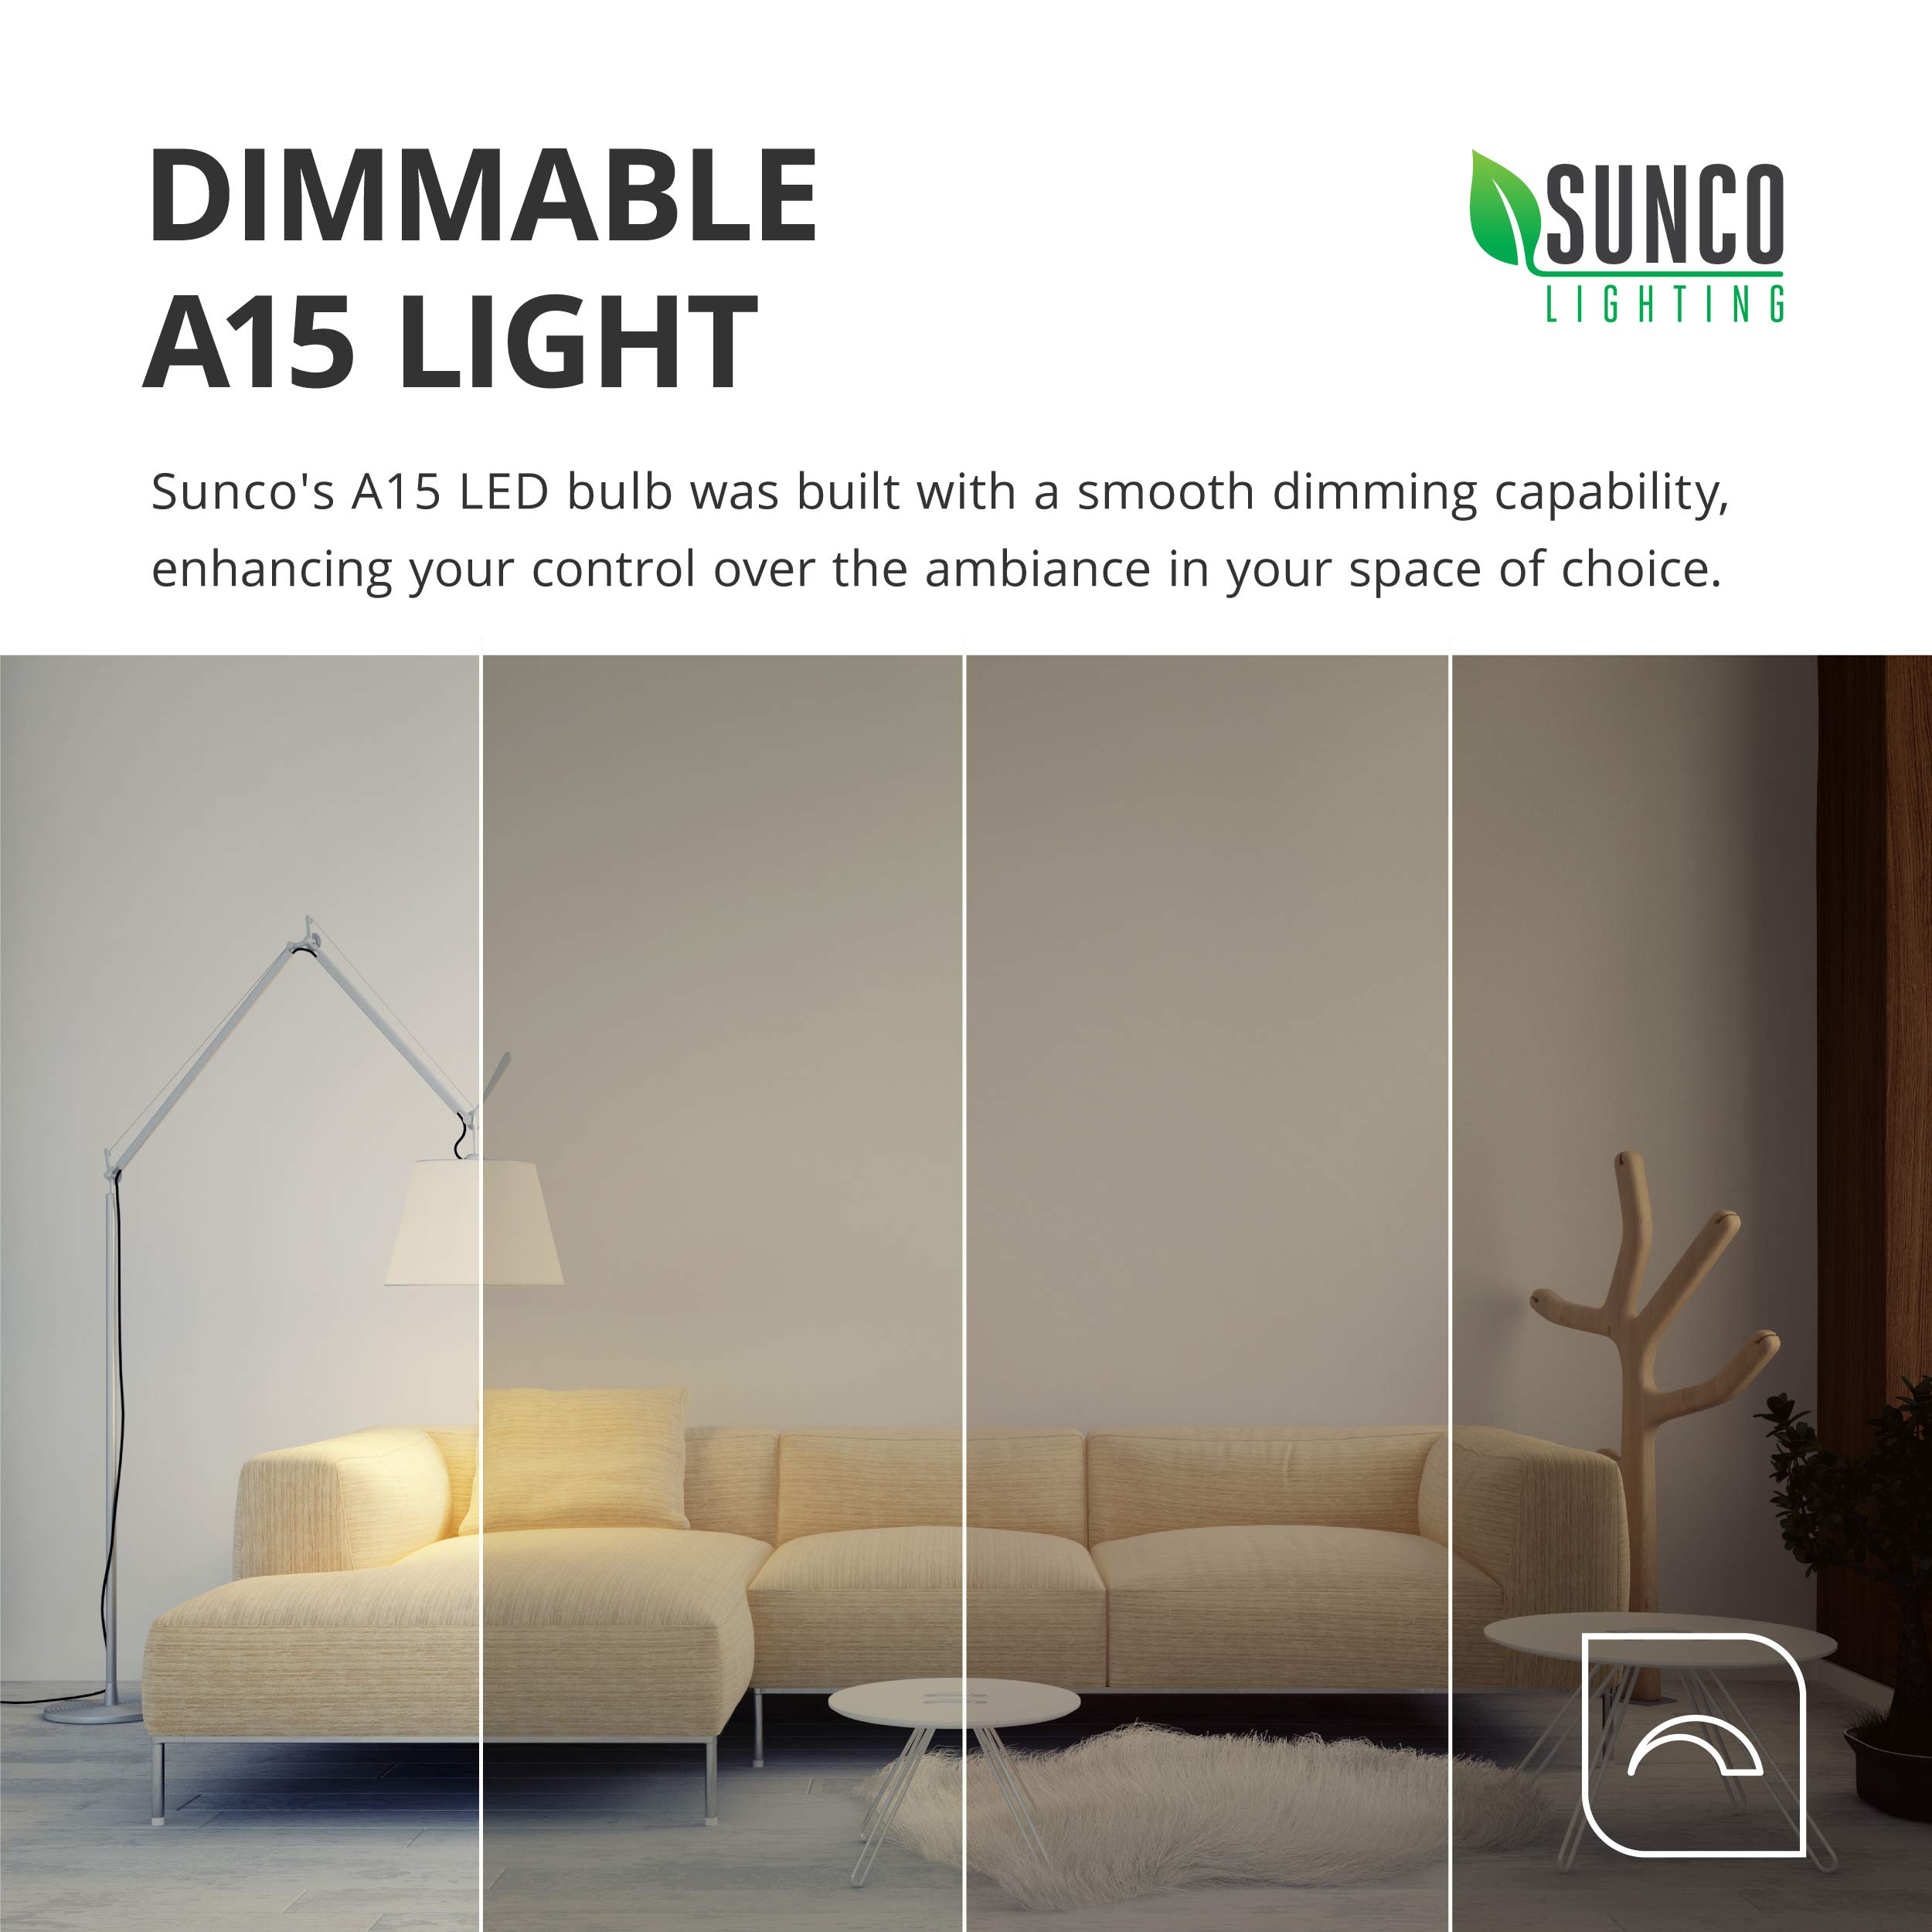 Sunco Lighting 10 Pack A15 LED Bulb, 8W=60W, 3000K Warm White, Dimmable, 800 LM, E26 Base, Refrigerator & Fan Light - UL, Energy Star by Sunco Lighting (Image #5)